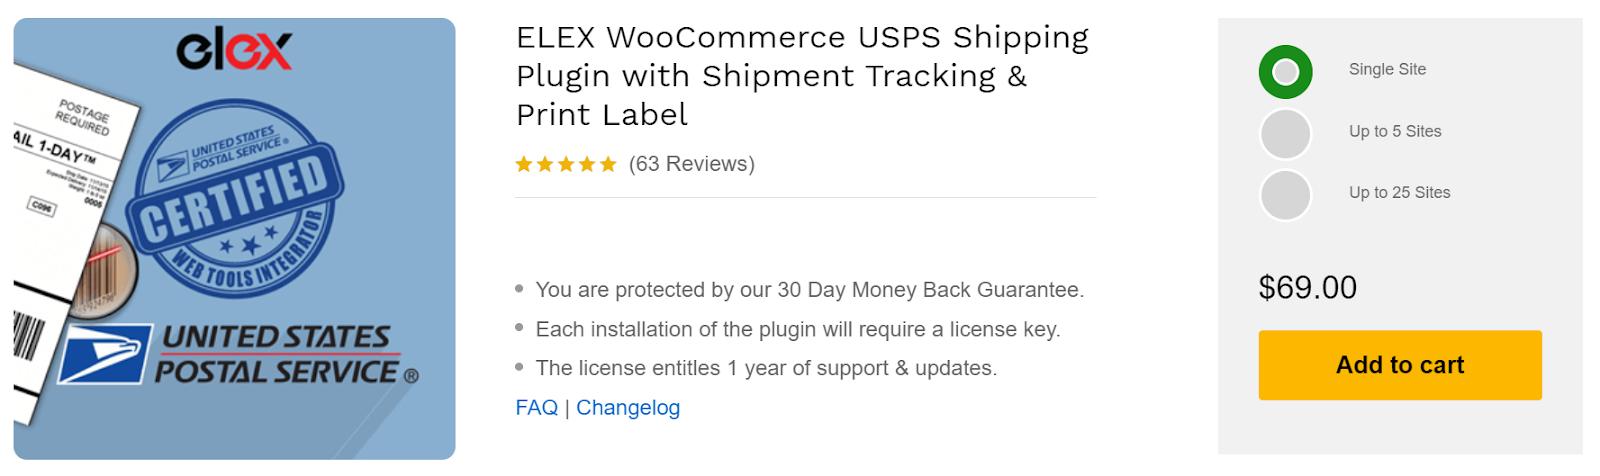 woocommerce usps plugin, woocommerce shipping plugins